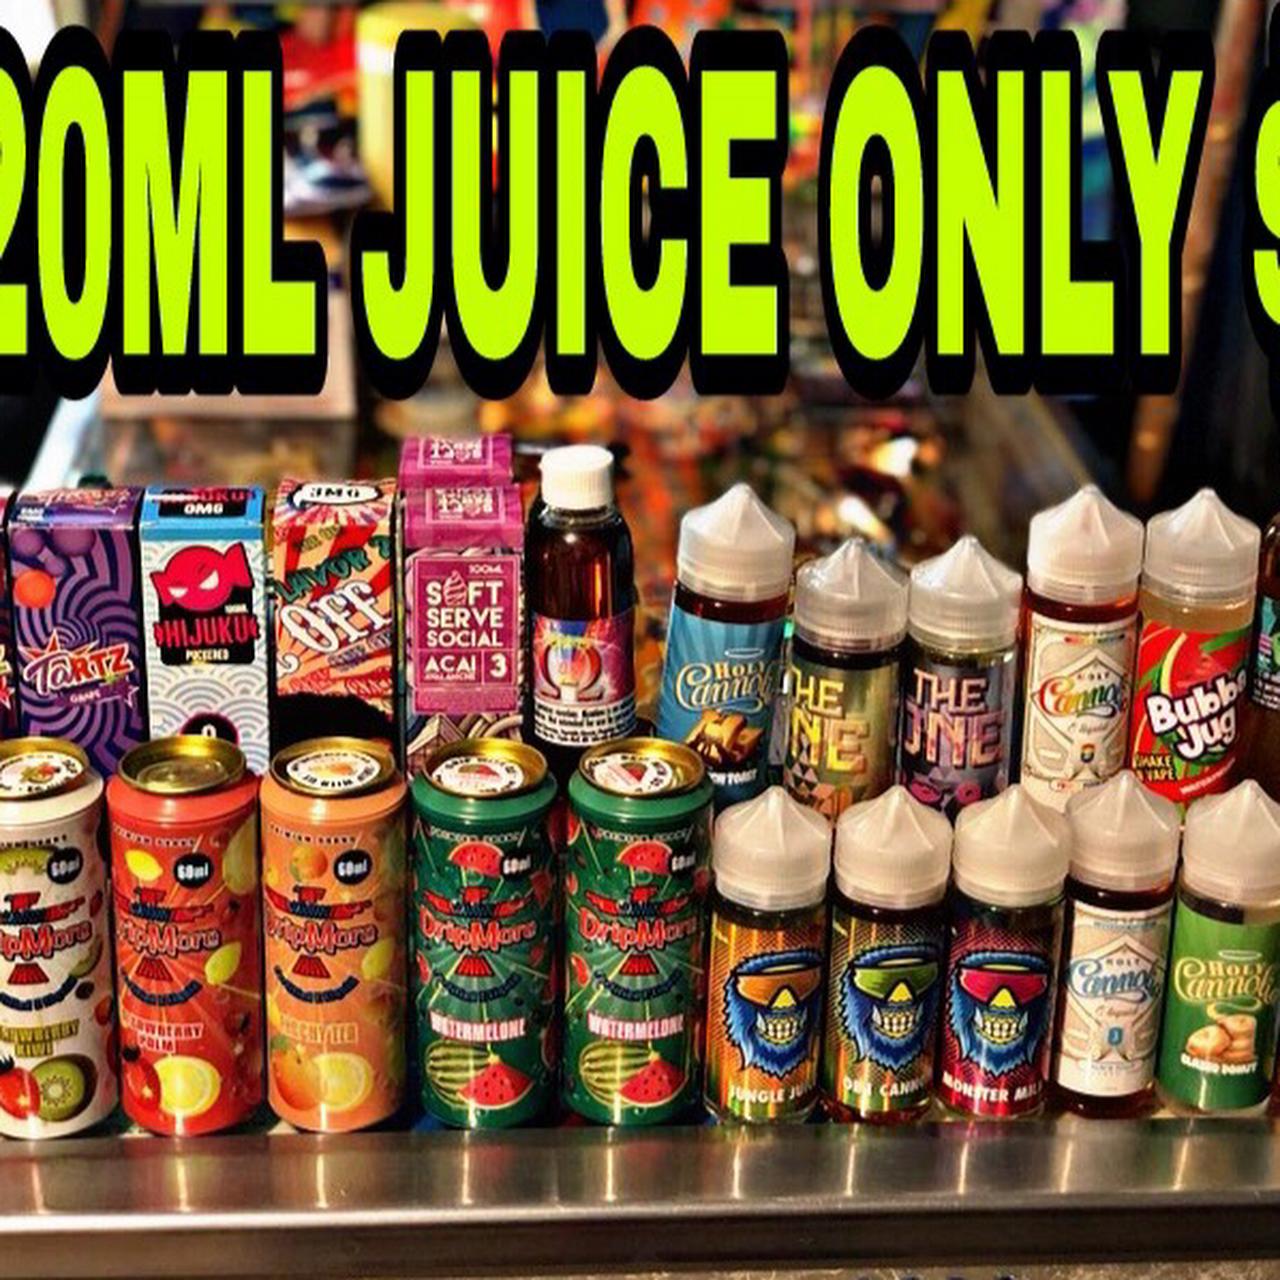 Pumpernickel Pops Smoke shop & Vape Store - Large selection